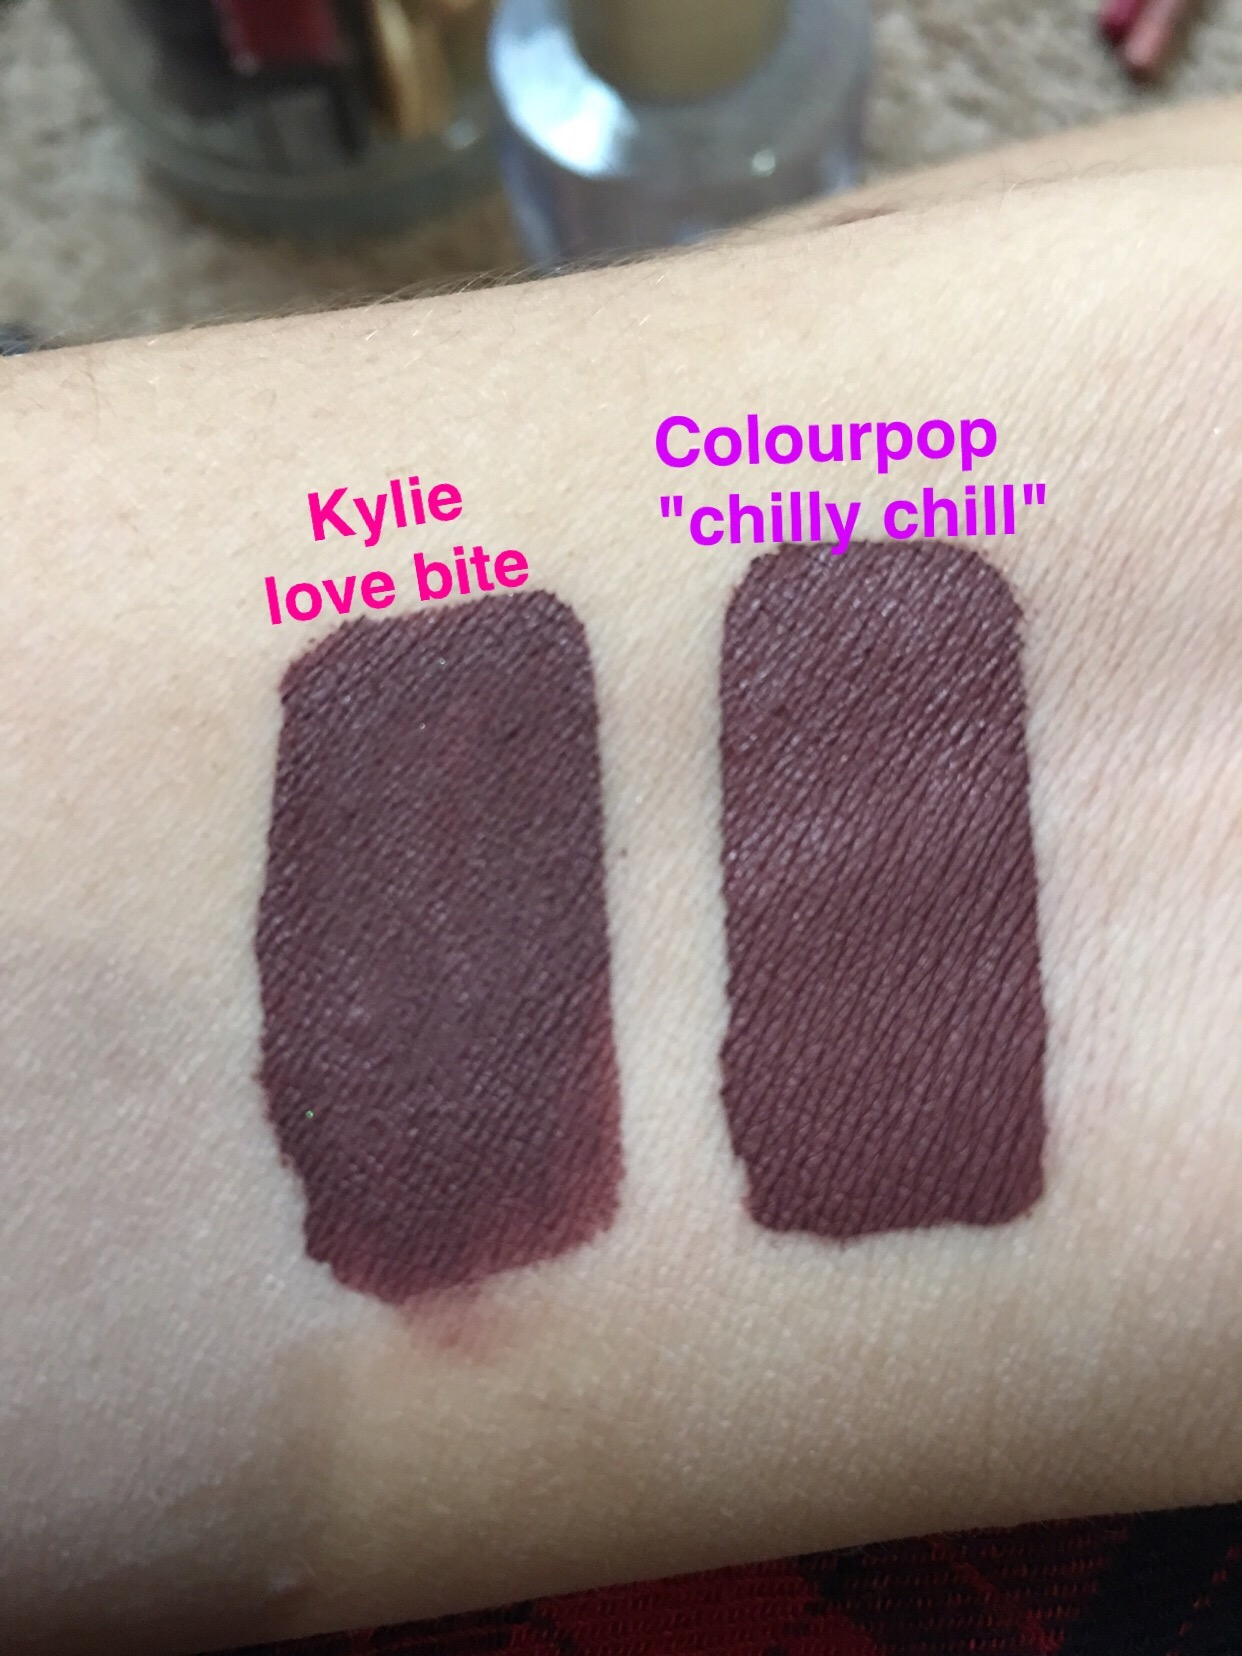 Kylie Cosmetics Love Bite Liquid Lipstick Dupes